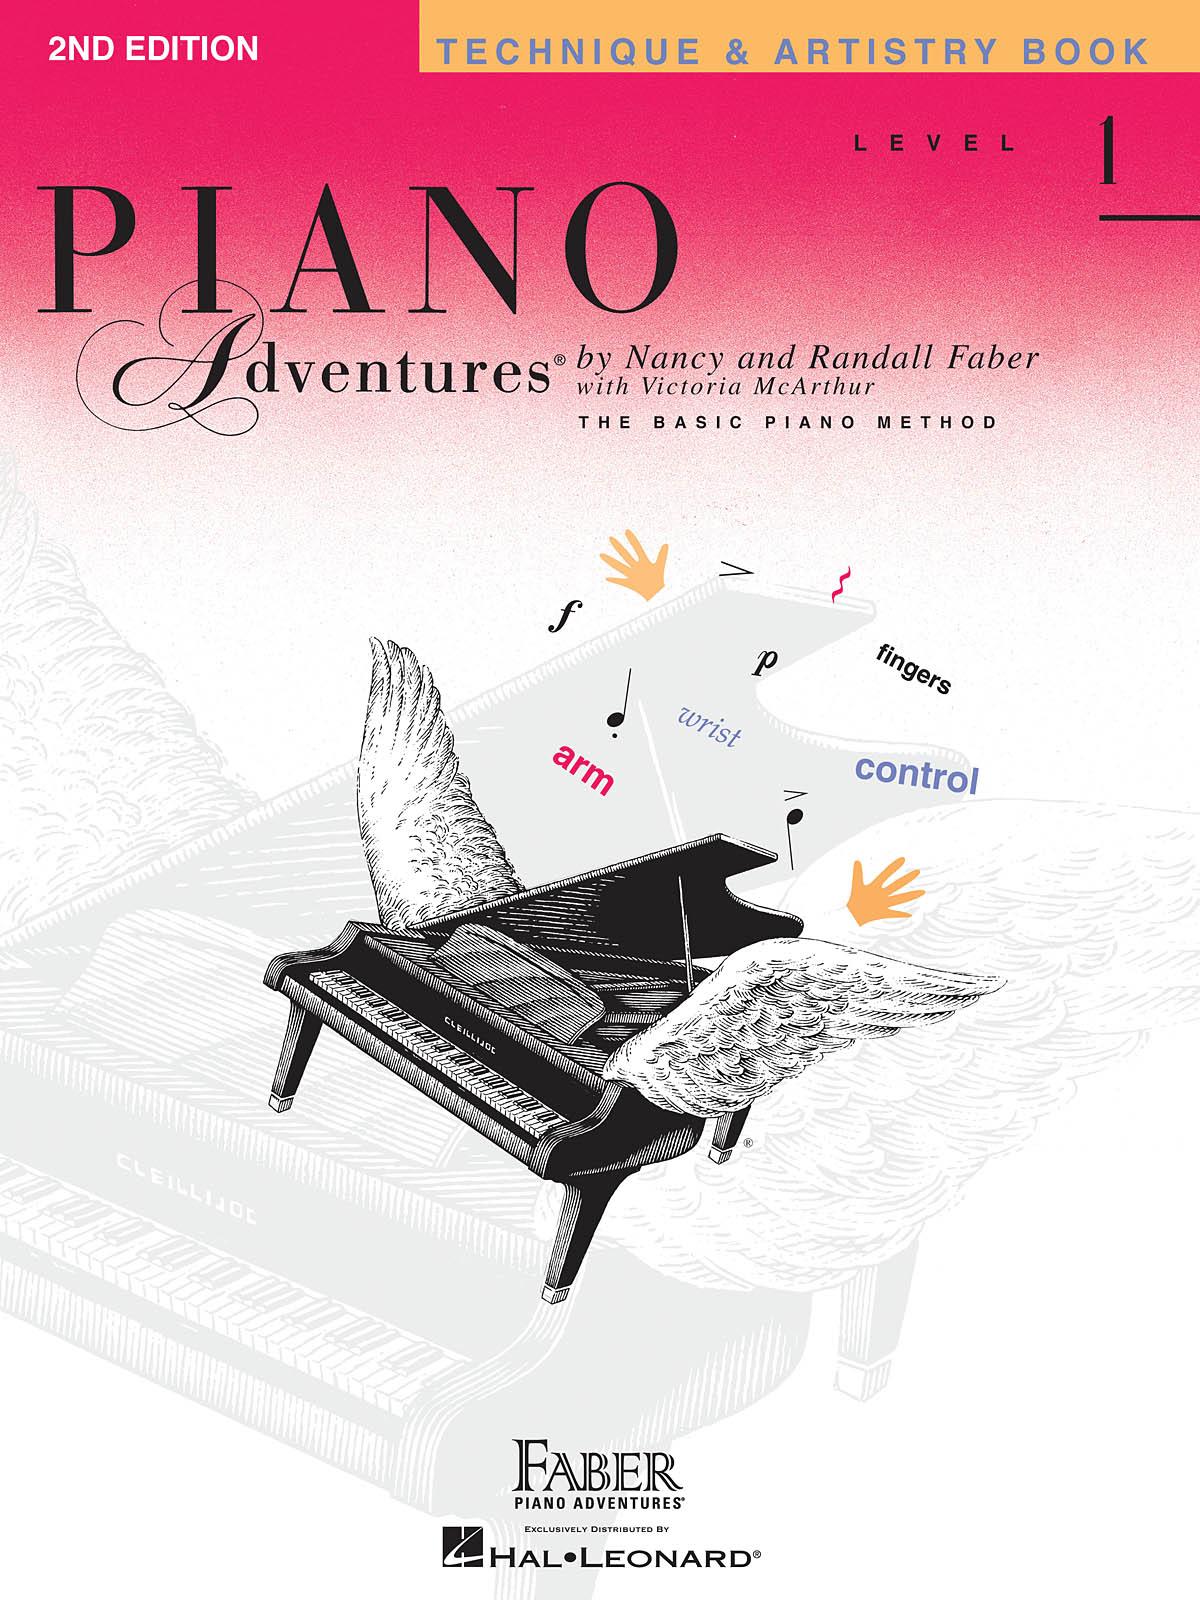 Faber Piano Adventures, Technique & Artistry Book, Level 1